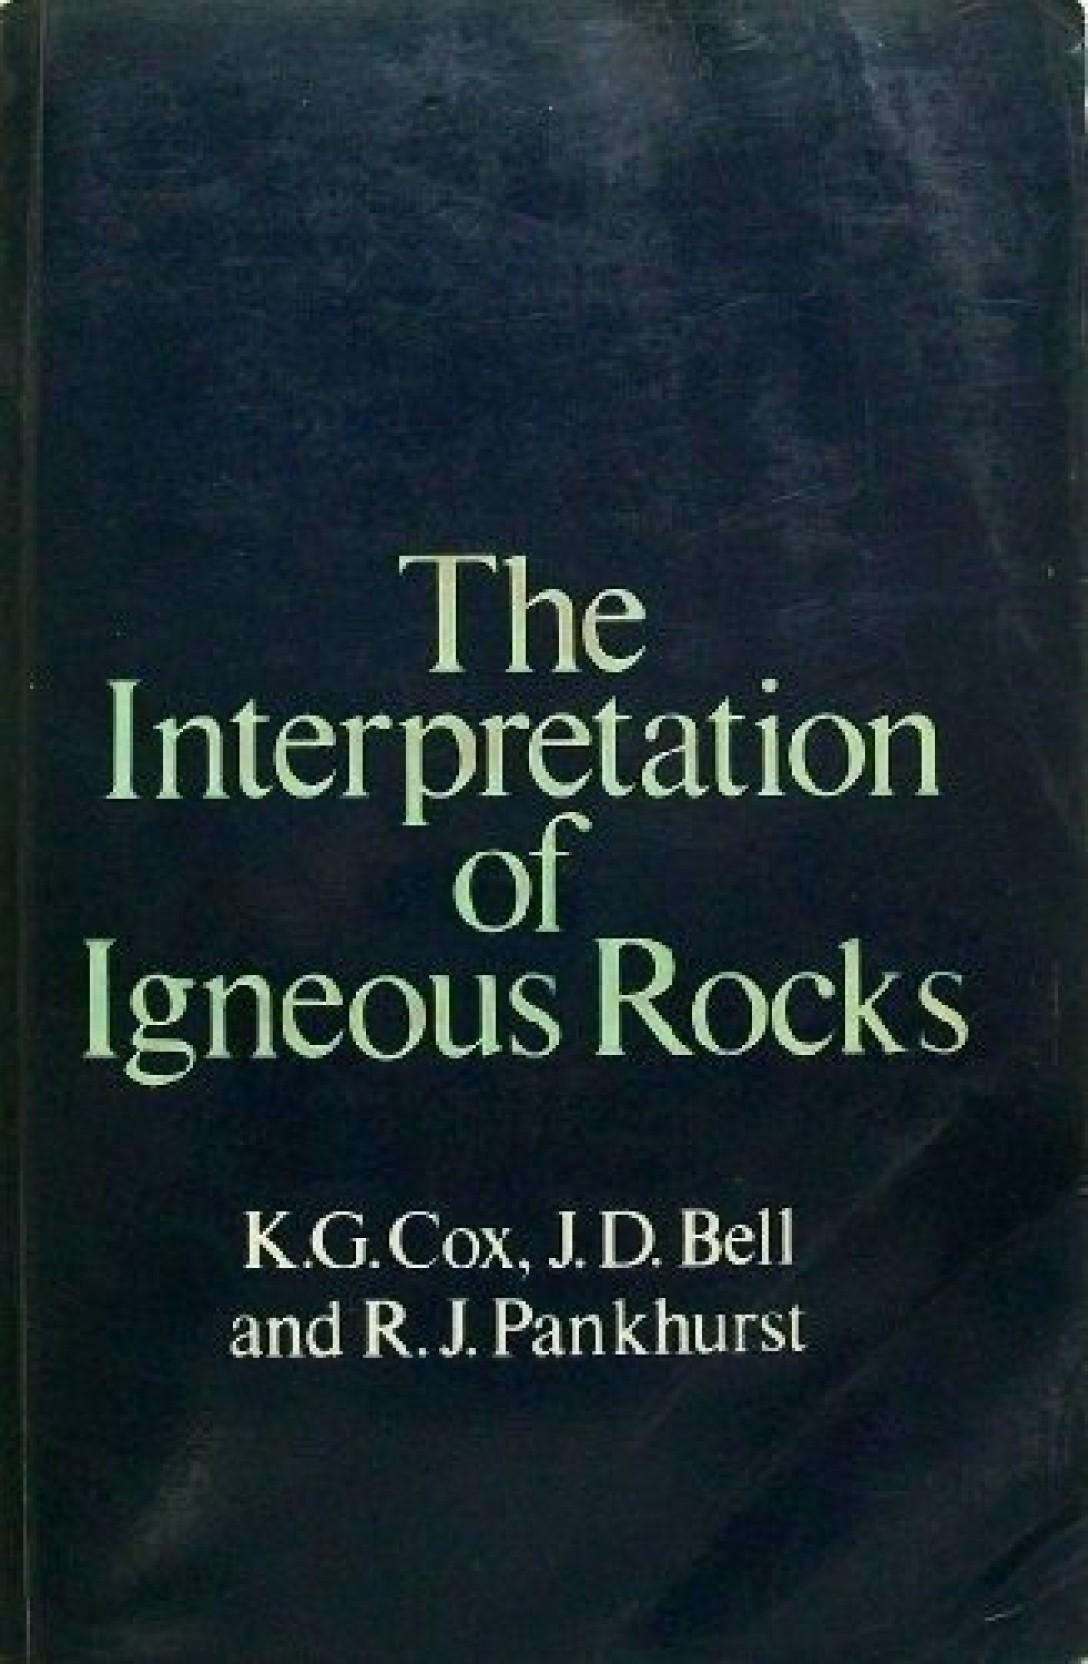 The Interpretation of Igneous Rocks. Share